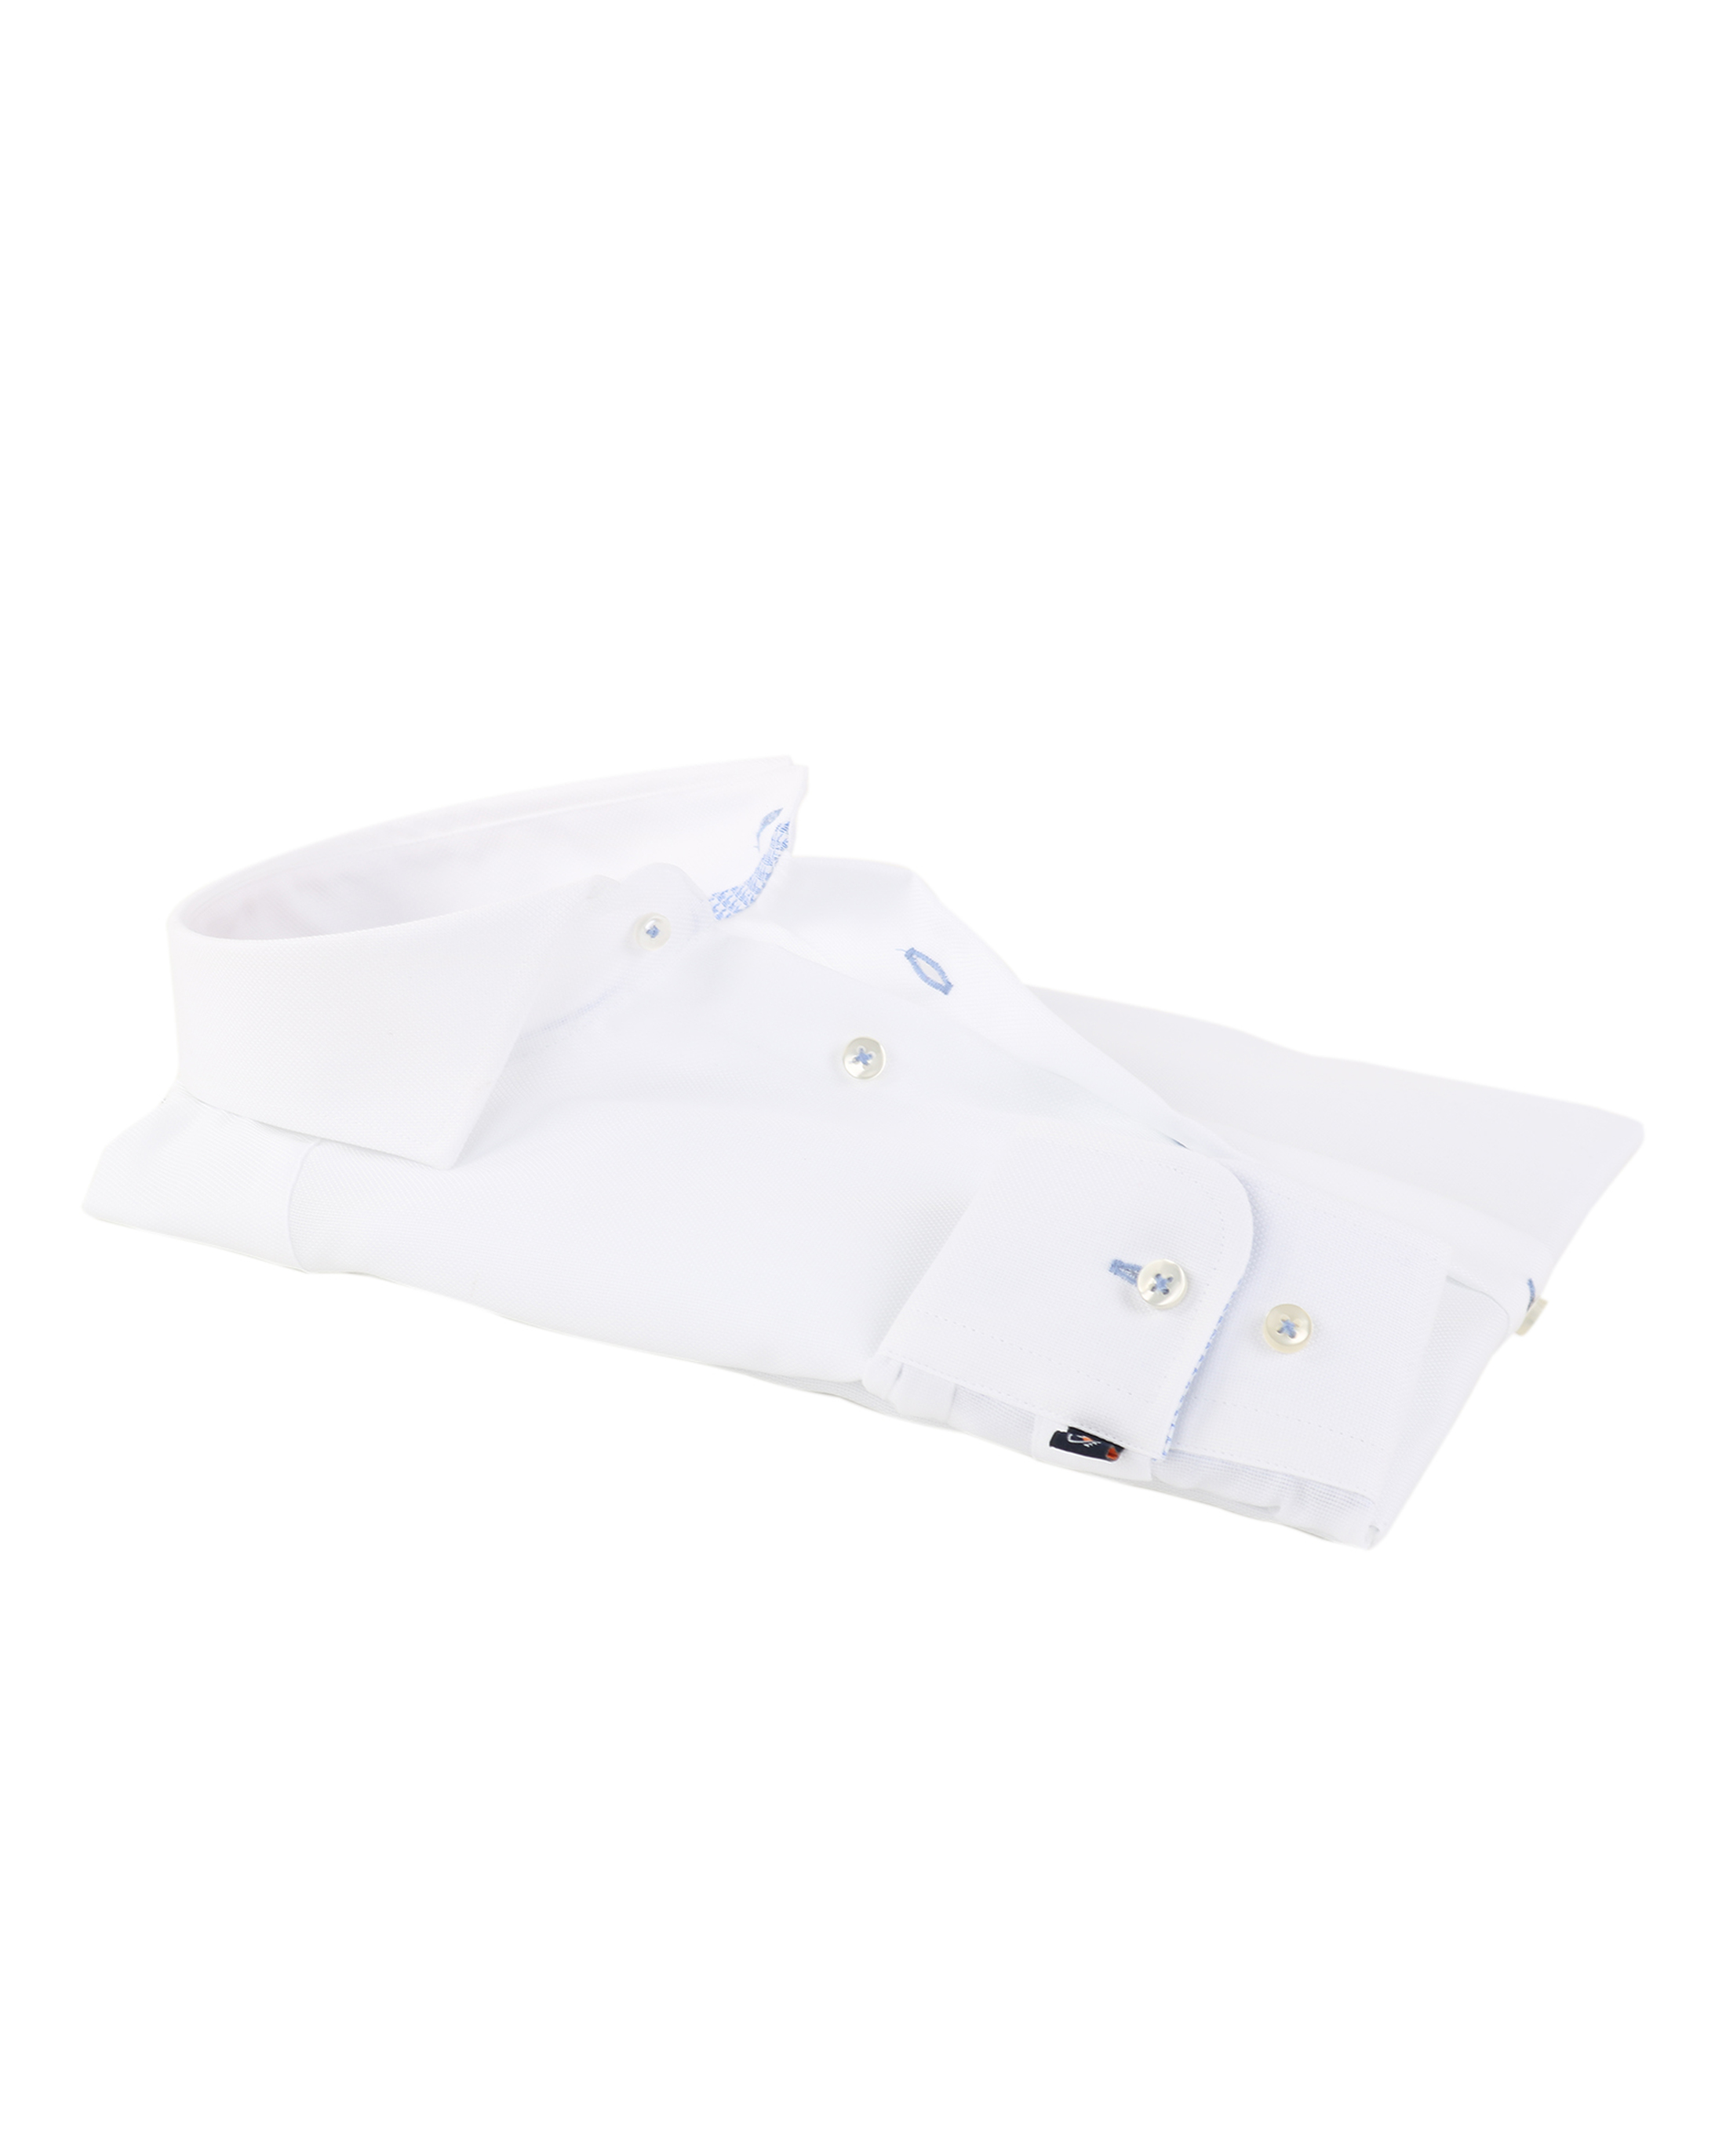 Mouwlengte 7 Overhemd Wit 150-1 foto 2